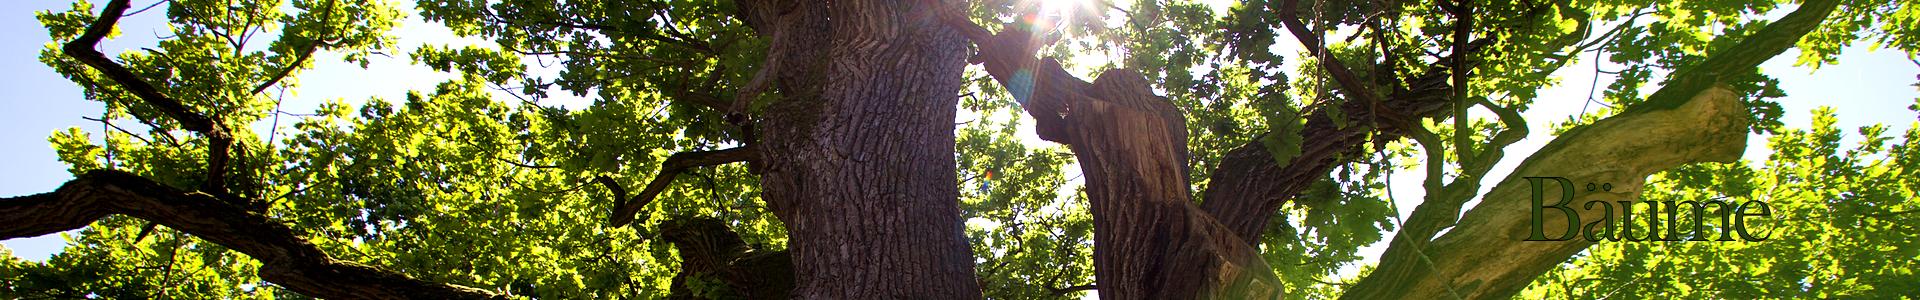 Header_Bäume